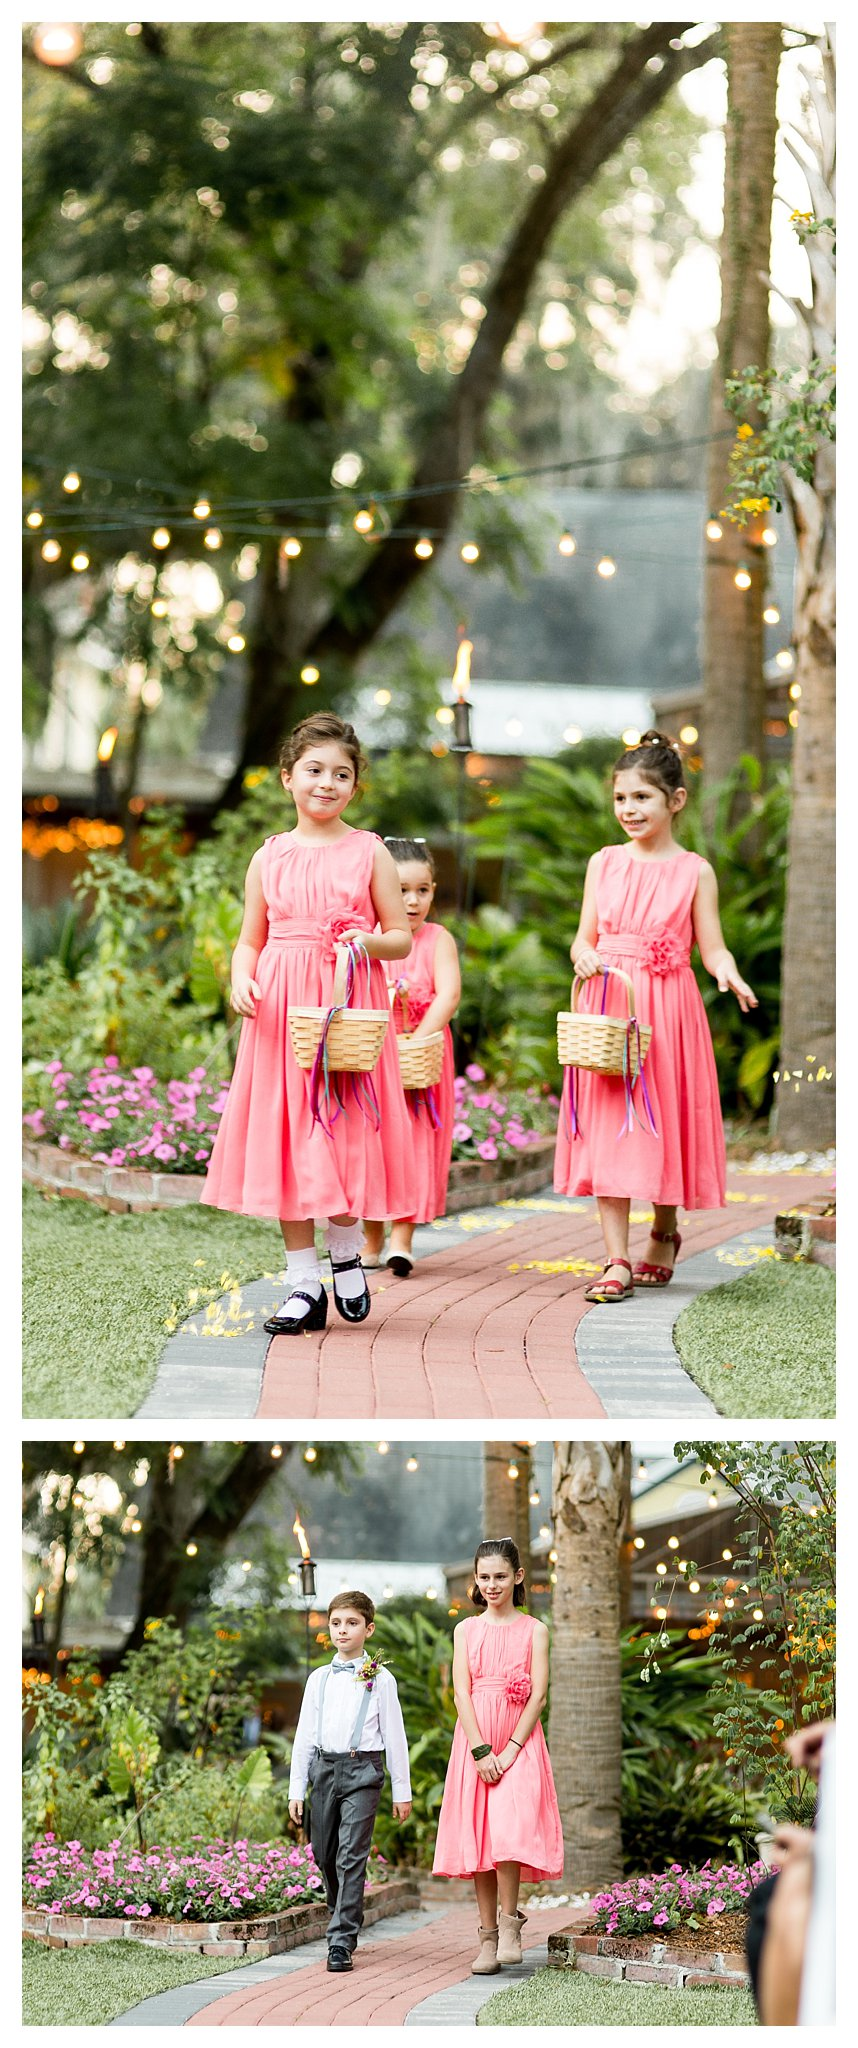 everleigh-photography-cincinnati-wedding-photographer-cincinnati-wedding-photography-sweetwater-branch-inn-gainesville-florida-wedding-26